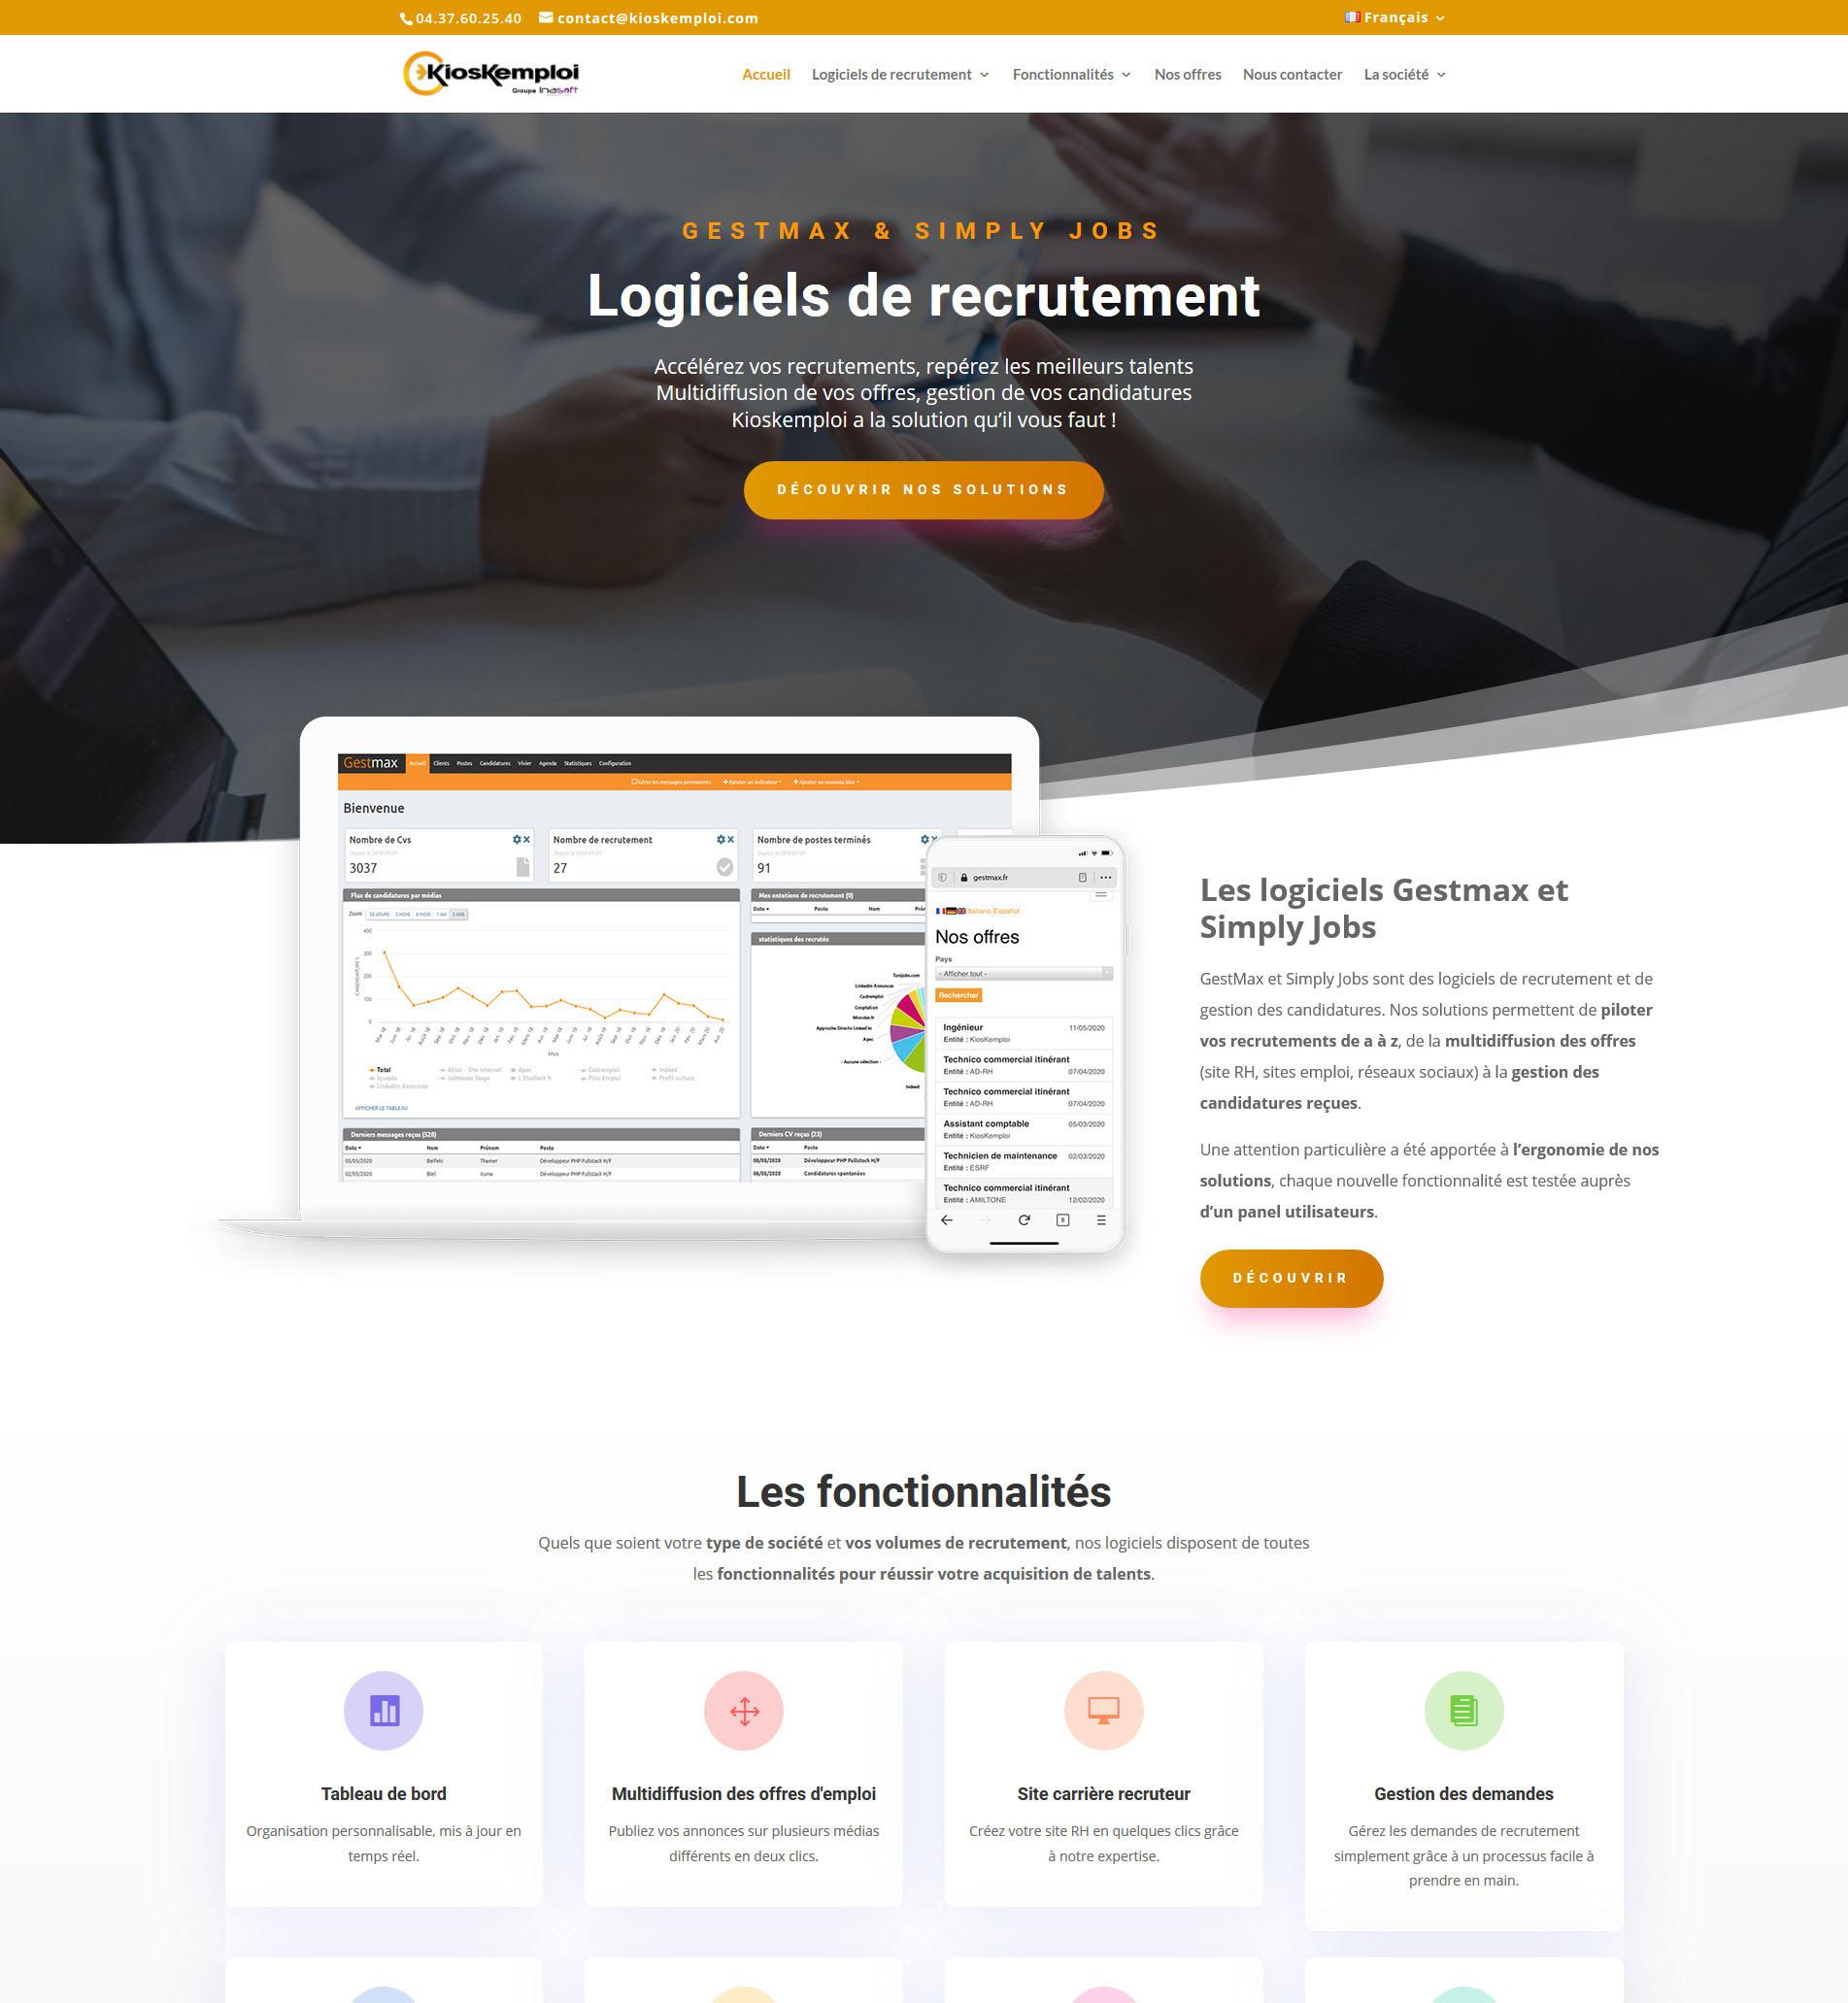 Le site Kioskemploi.fr fait peau neuve